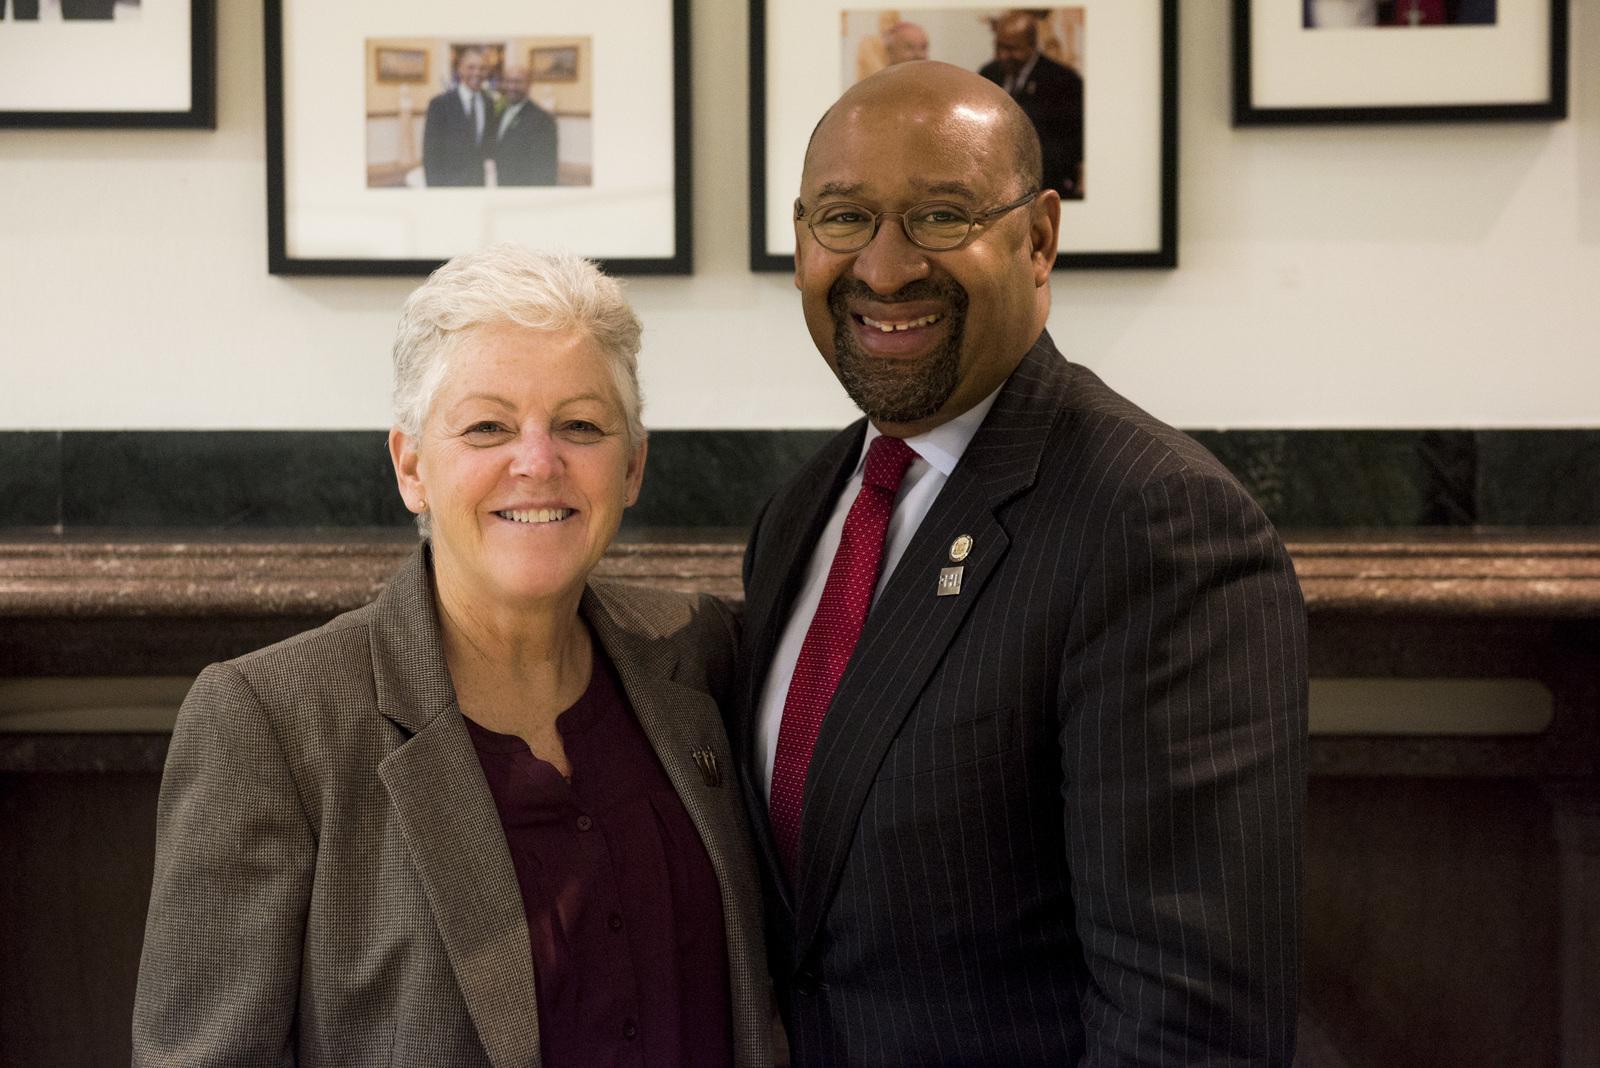 Office of the Administrator - Philadelphia - Administrator Gina McCarthy visiting the Food Lab at Drexel University [412-APD-1265-2014-11-14_Philadelphia_044.jpg]